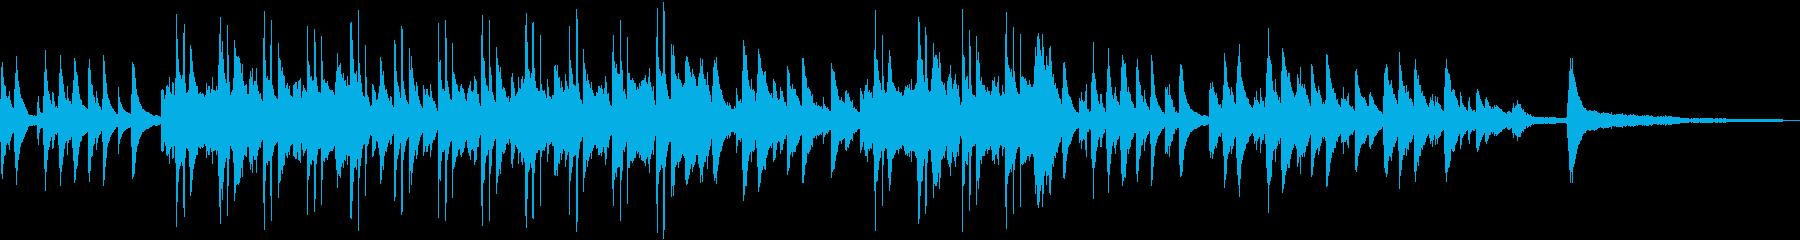 Piano/Clarinet/Guit…の再生済みの波形